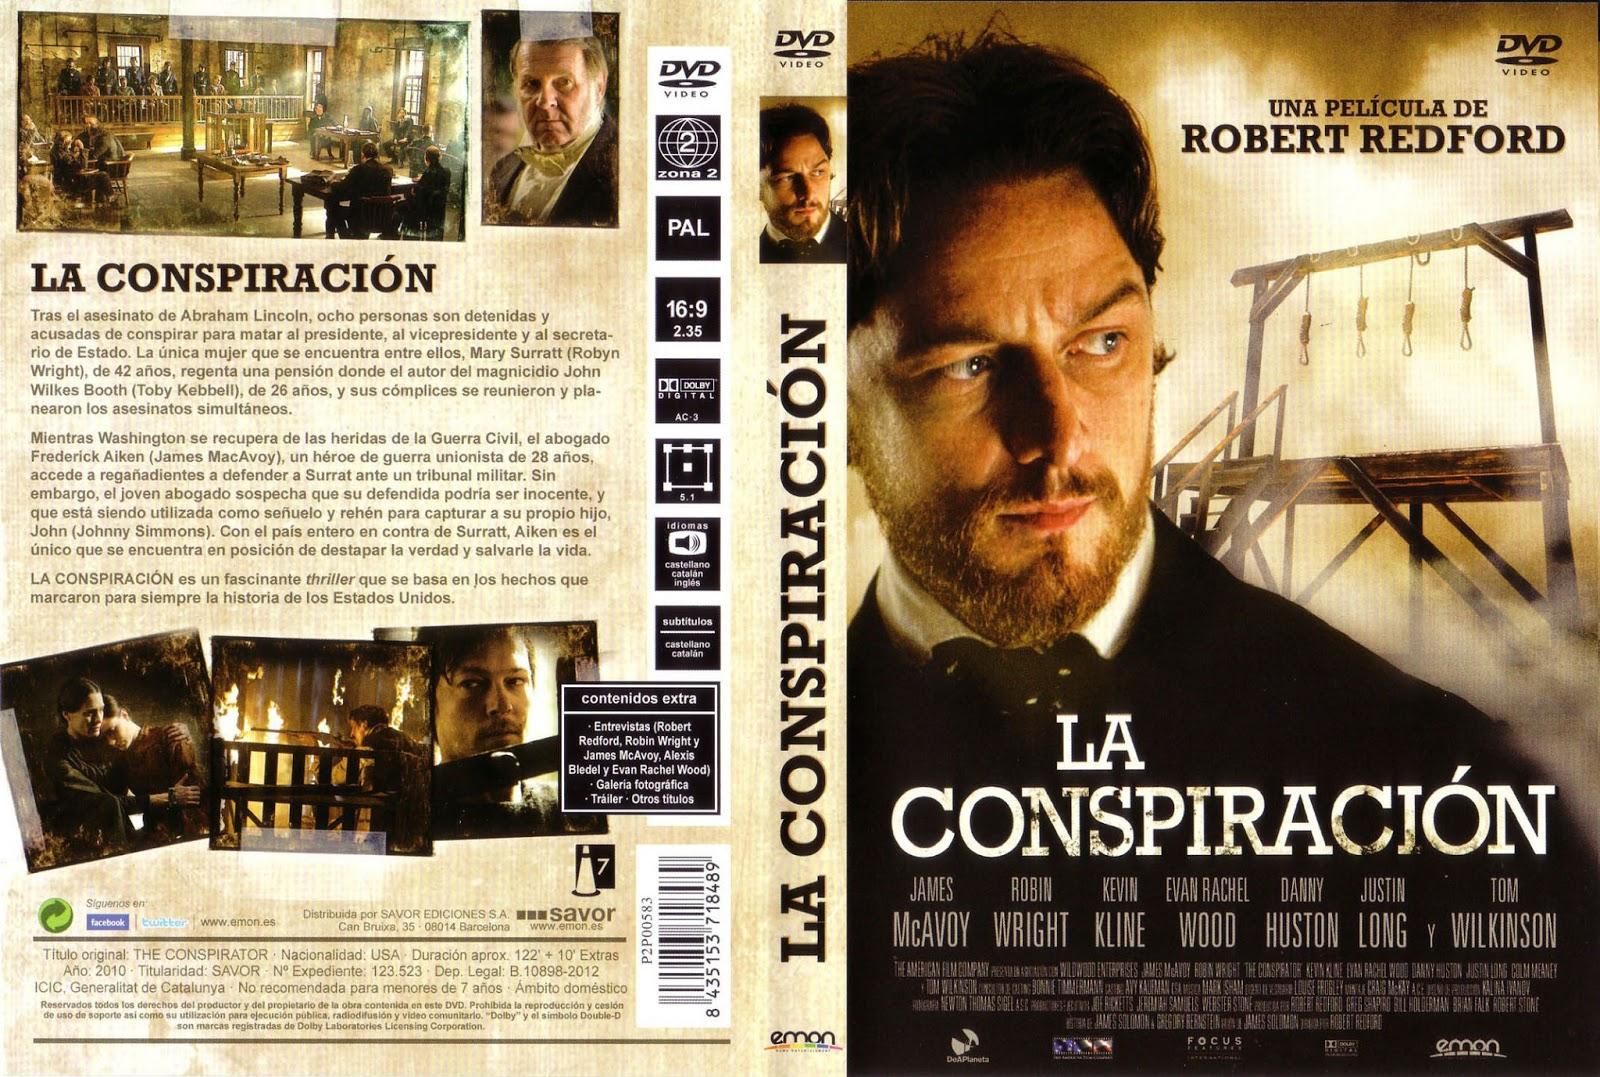 La Conspiracion DVD